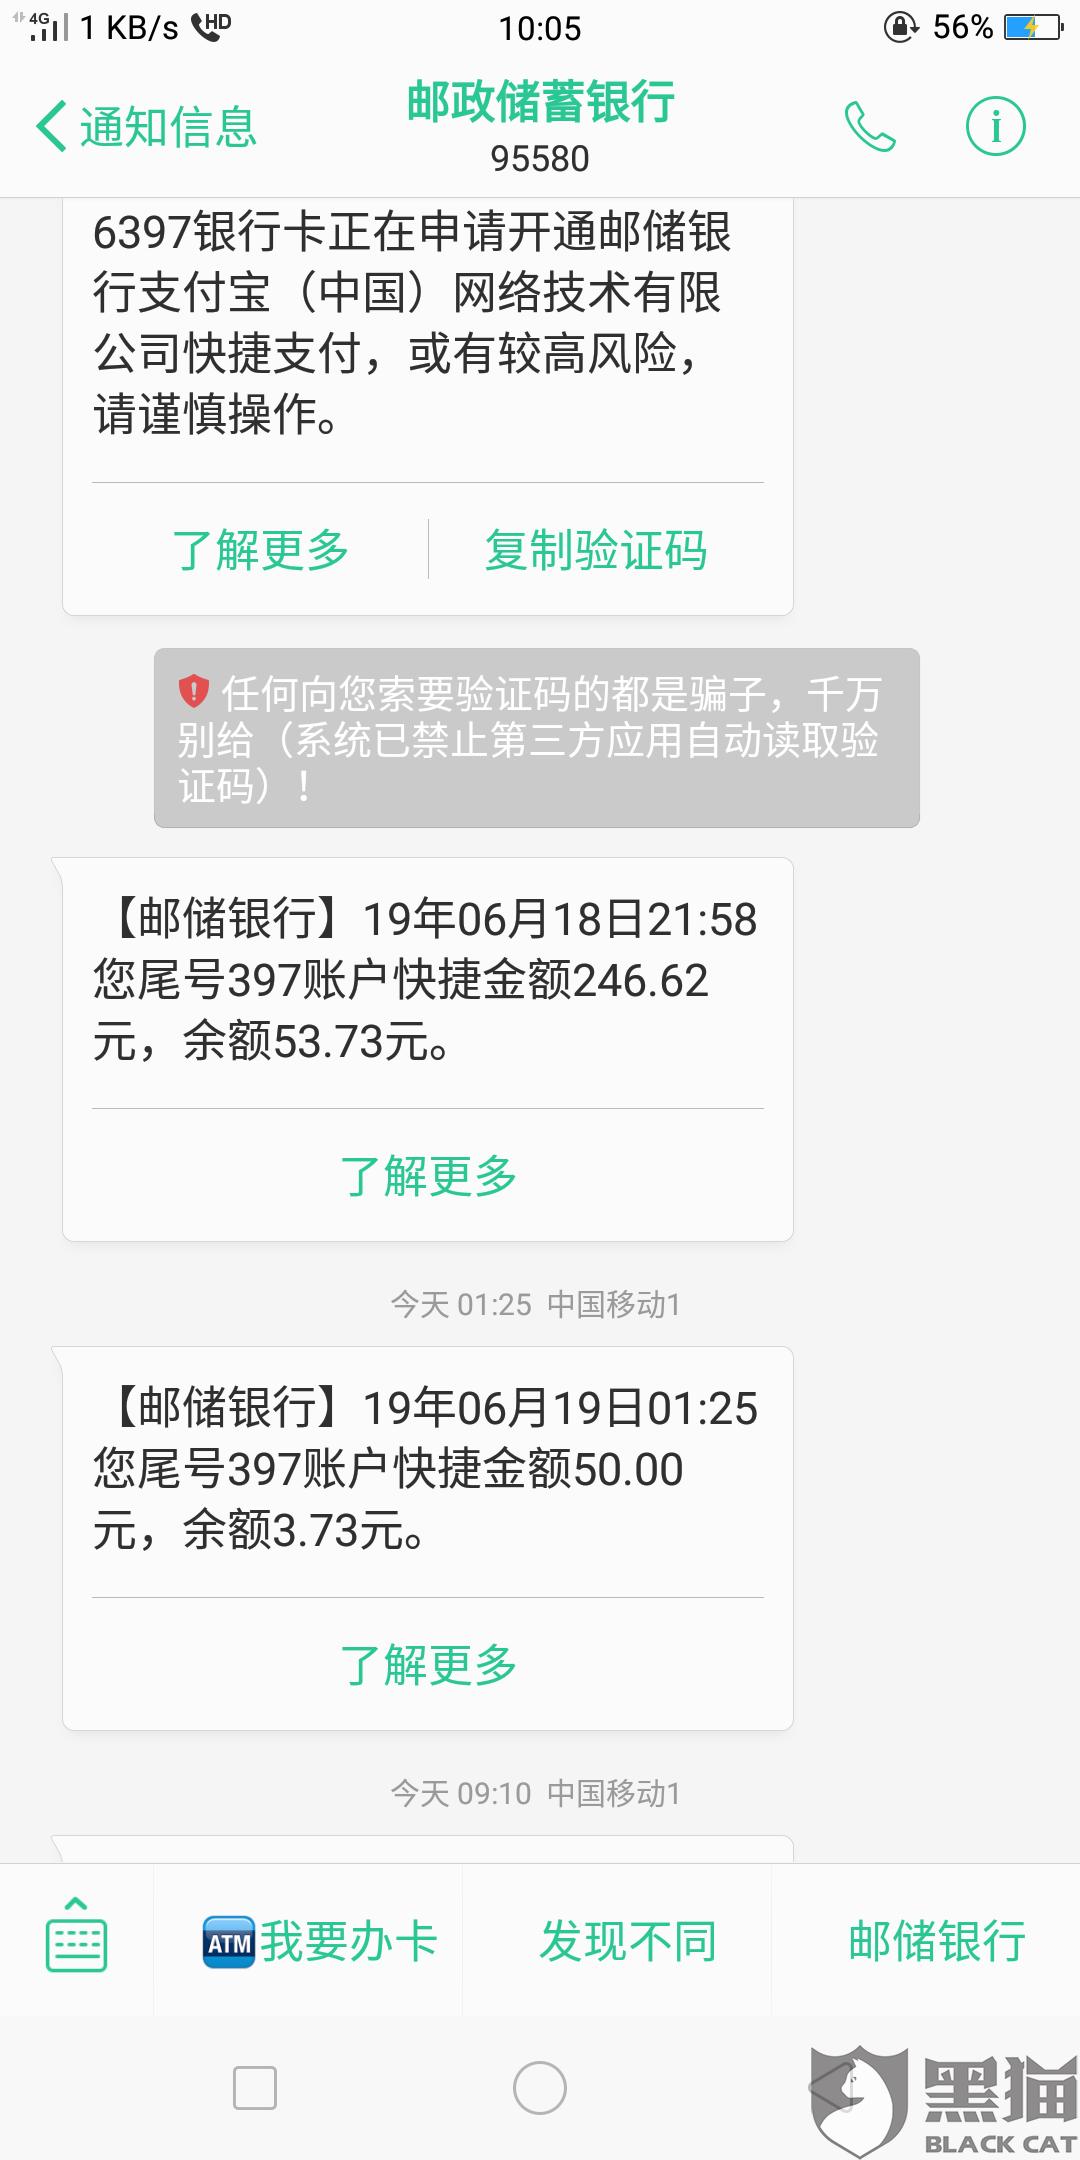 windows7激活工具,黑猫投诉:在我不知道的情况下被讯付上海造艺网络技术有限公司扣